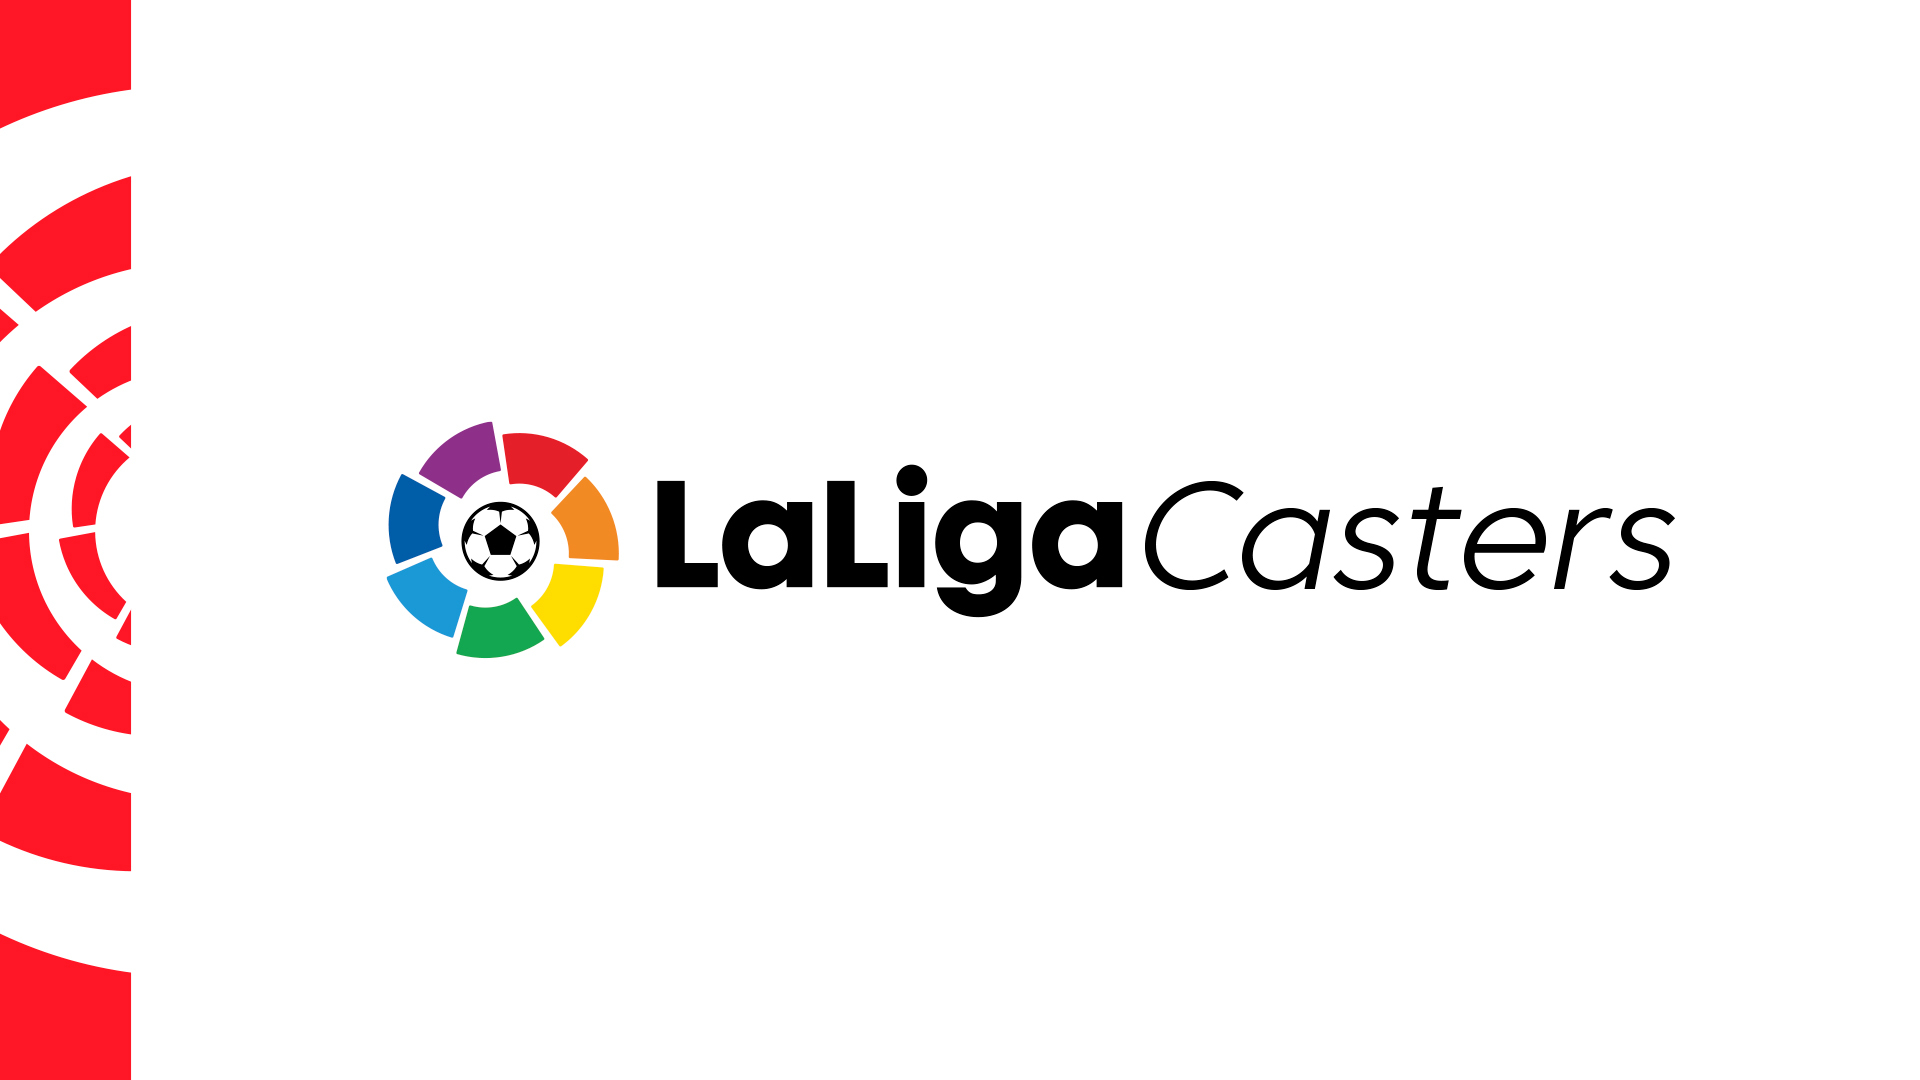 LaLigaCasters